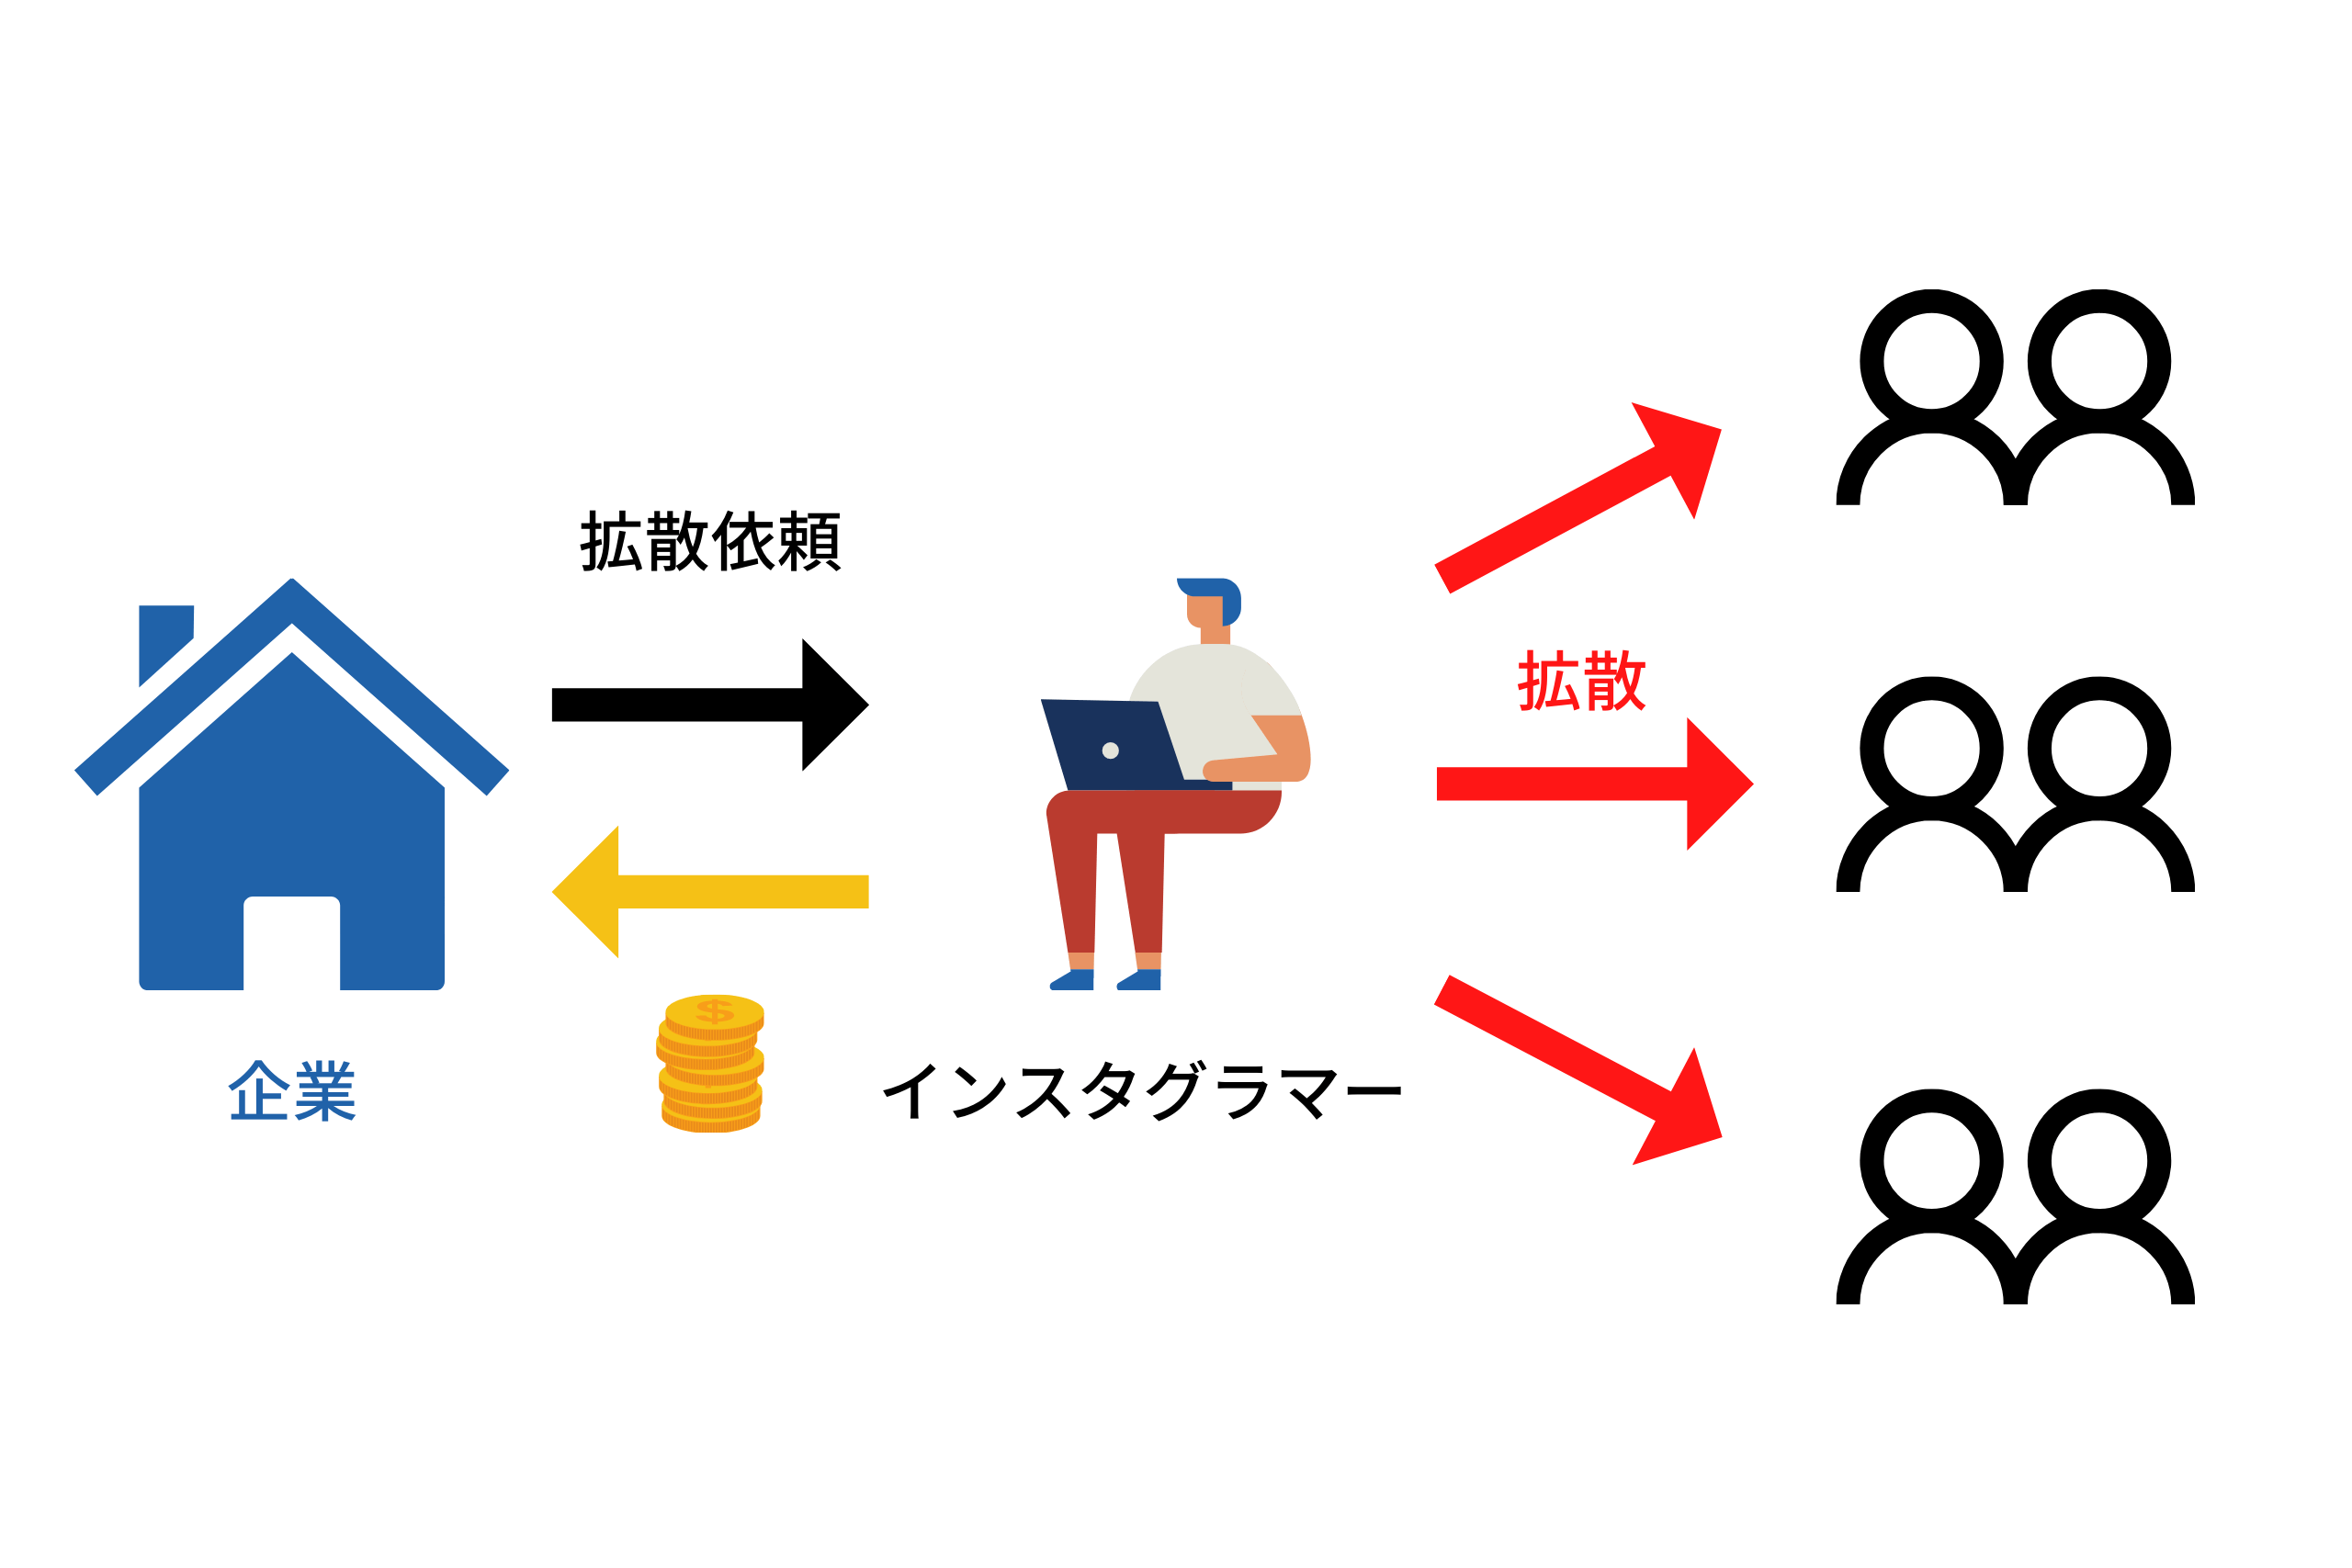 Advertising revenue illustration